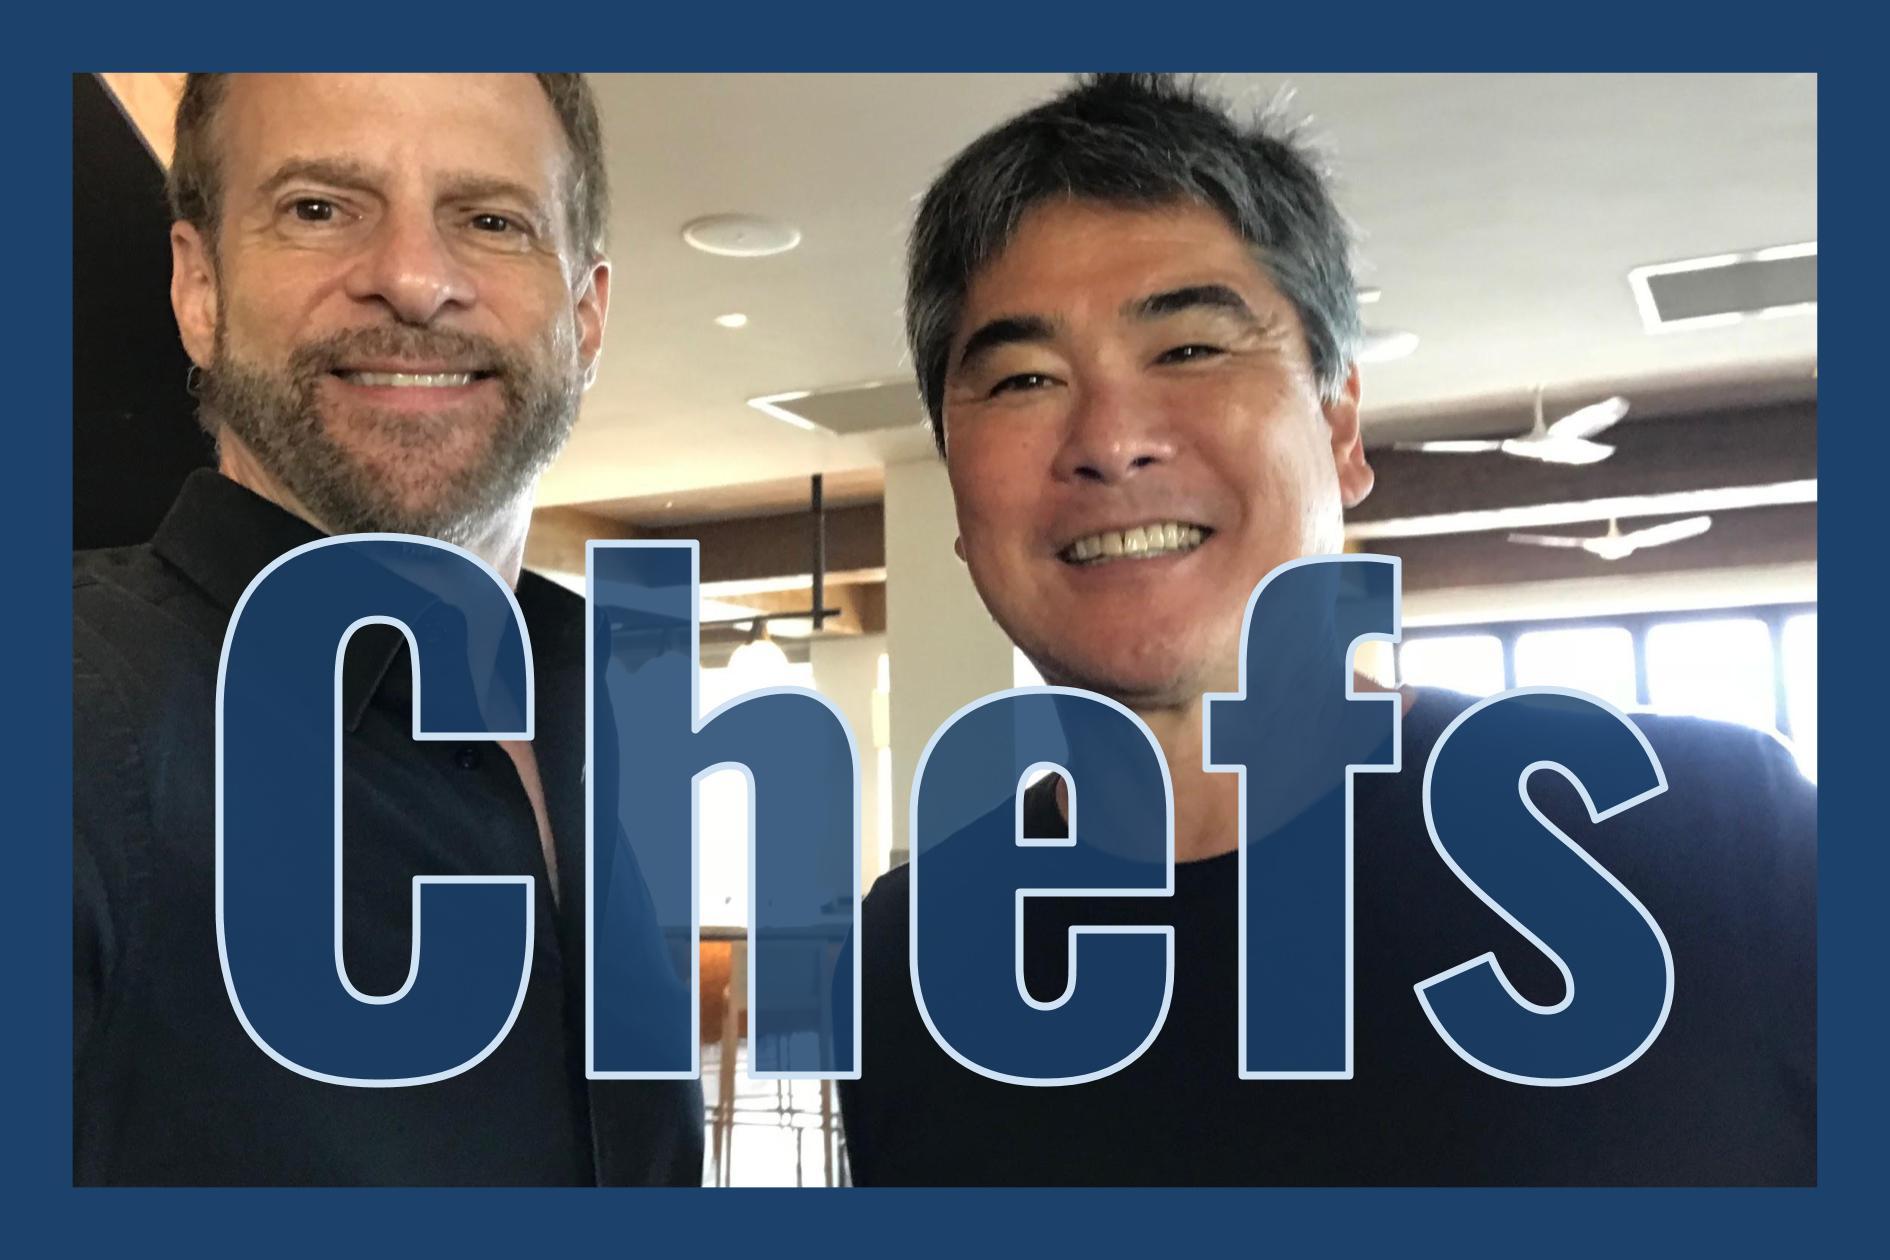 1Party Slate TWB Profile Meme - Chefs